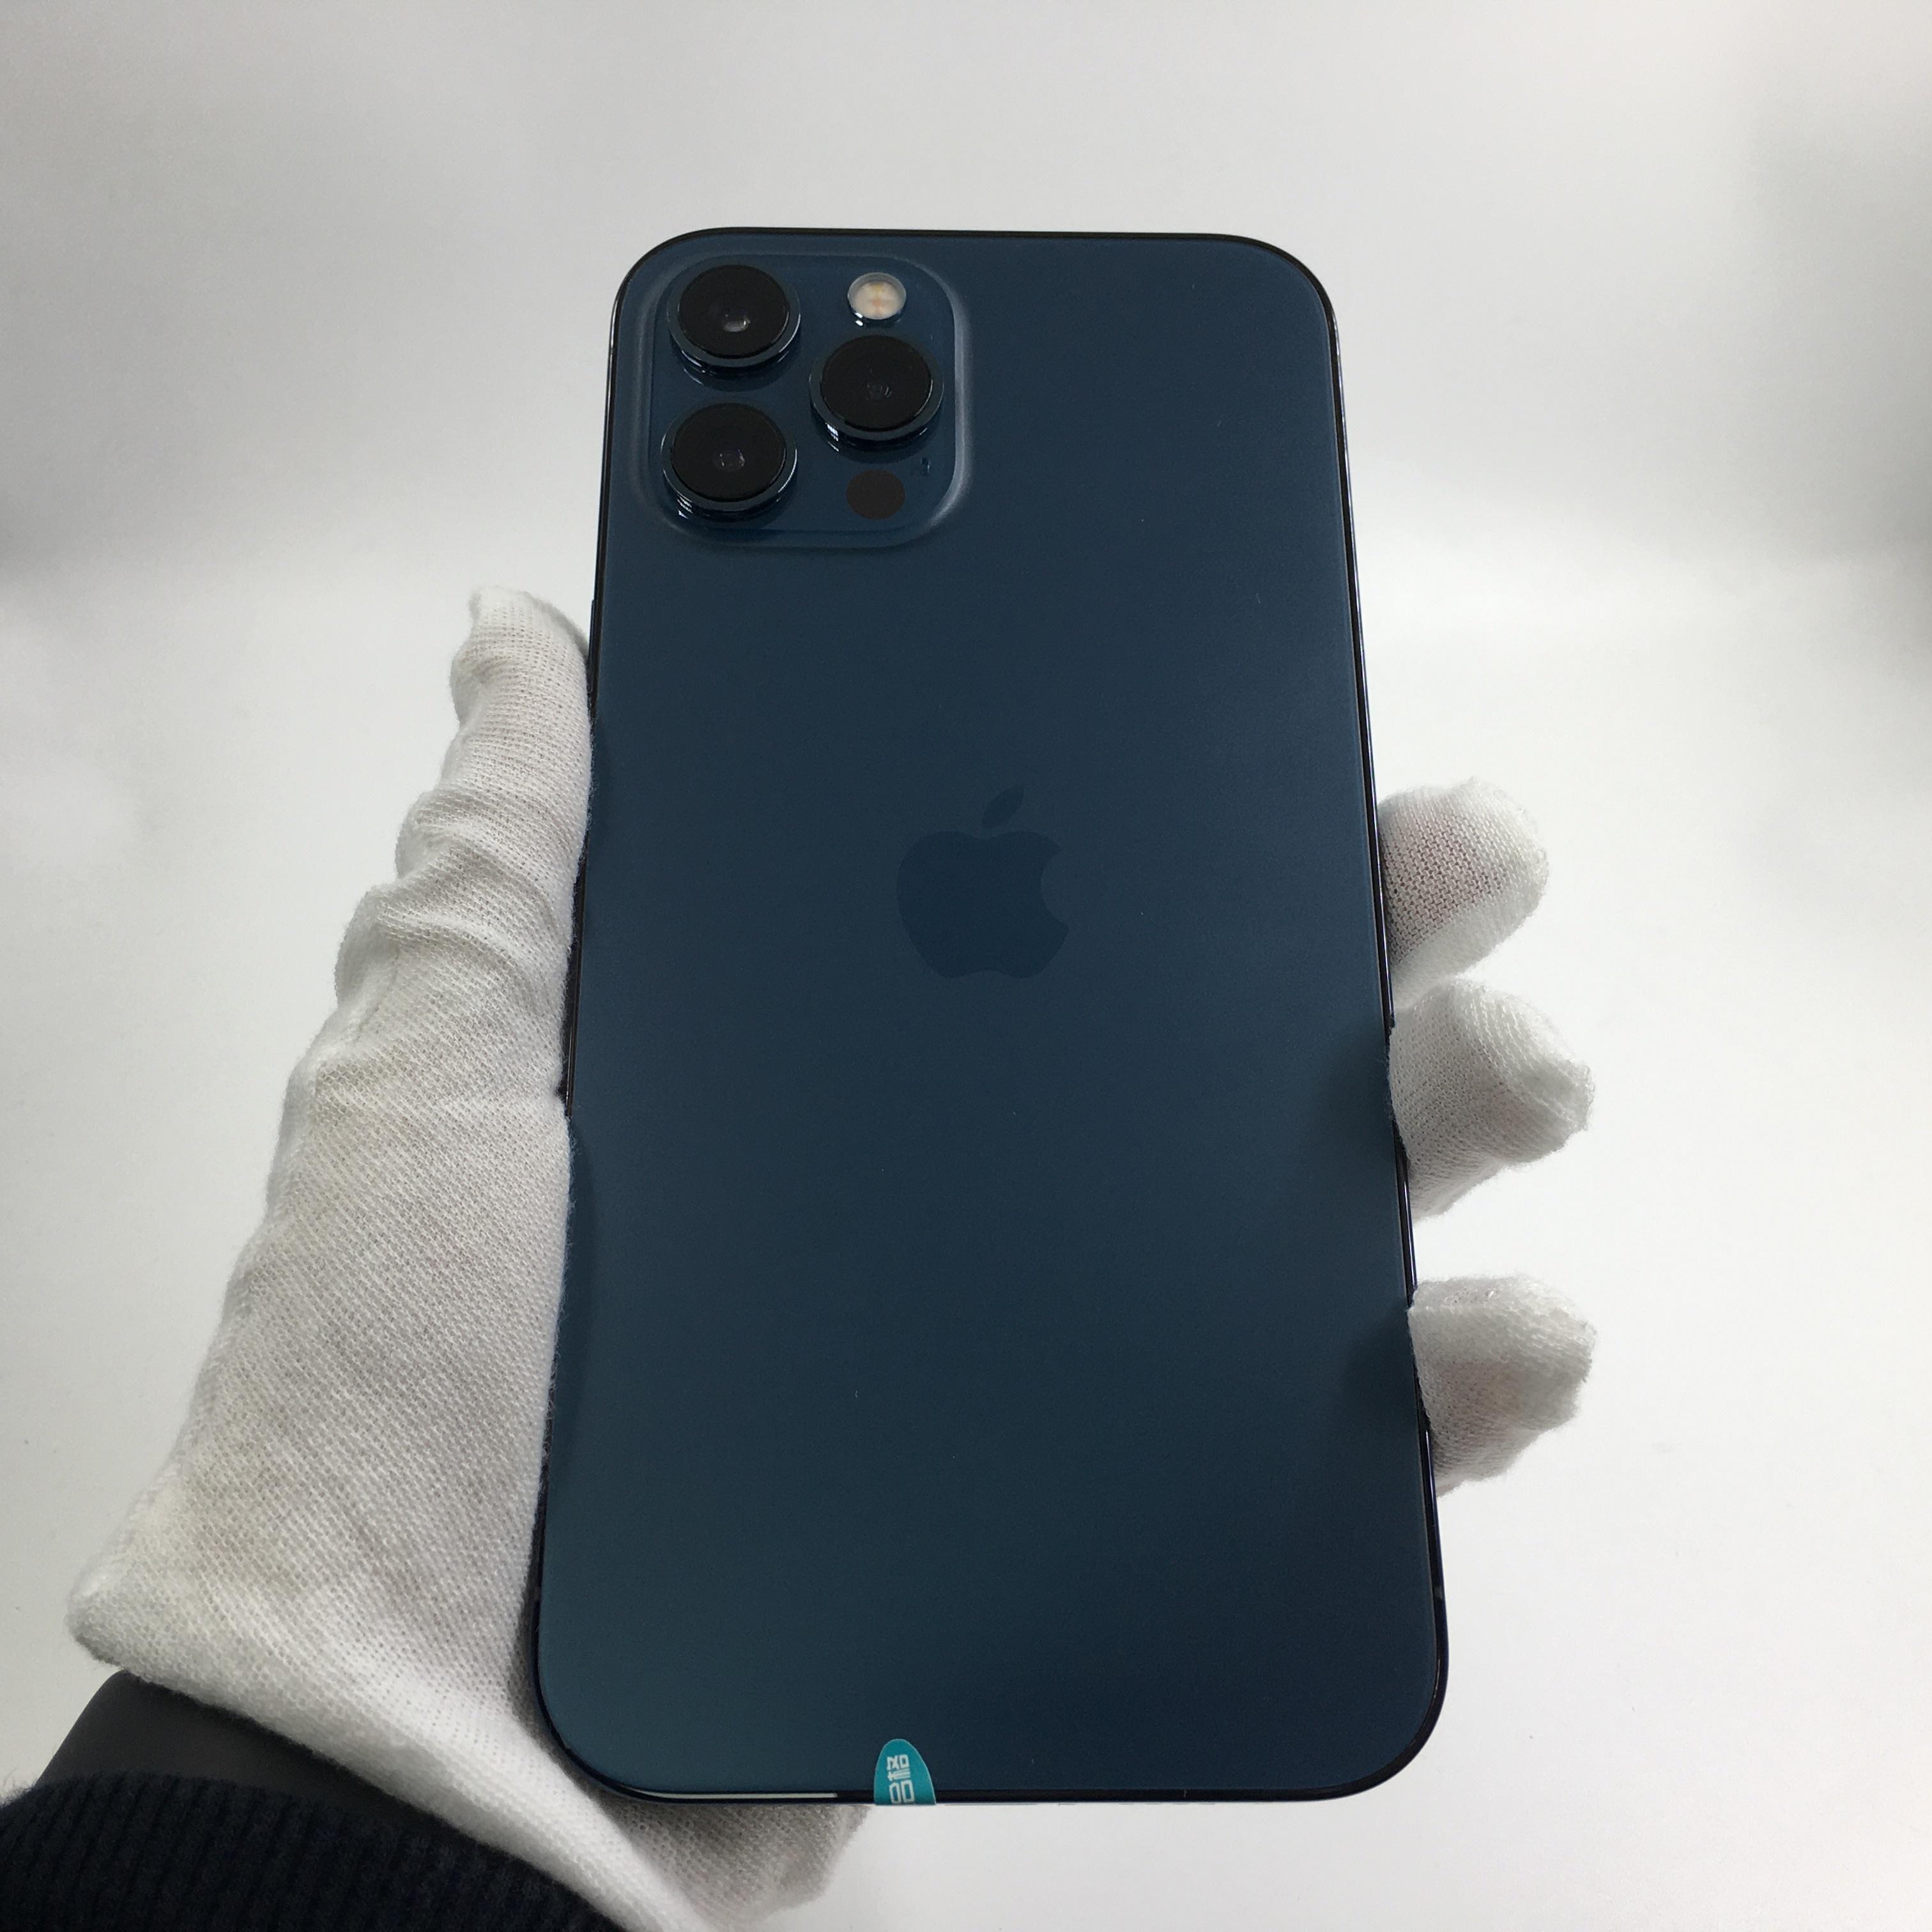 苹果【iPhone 12 Pro Max】99新